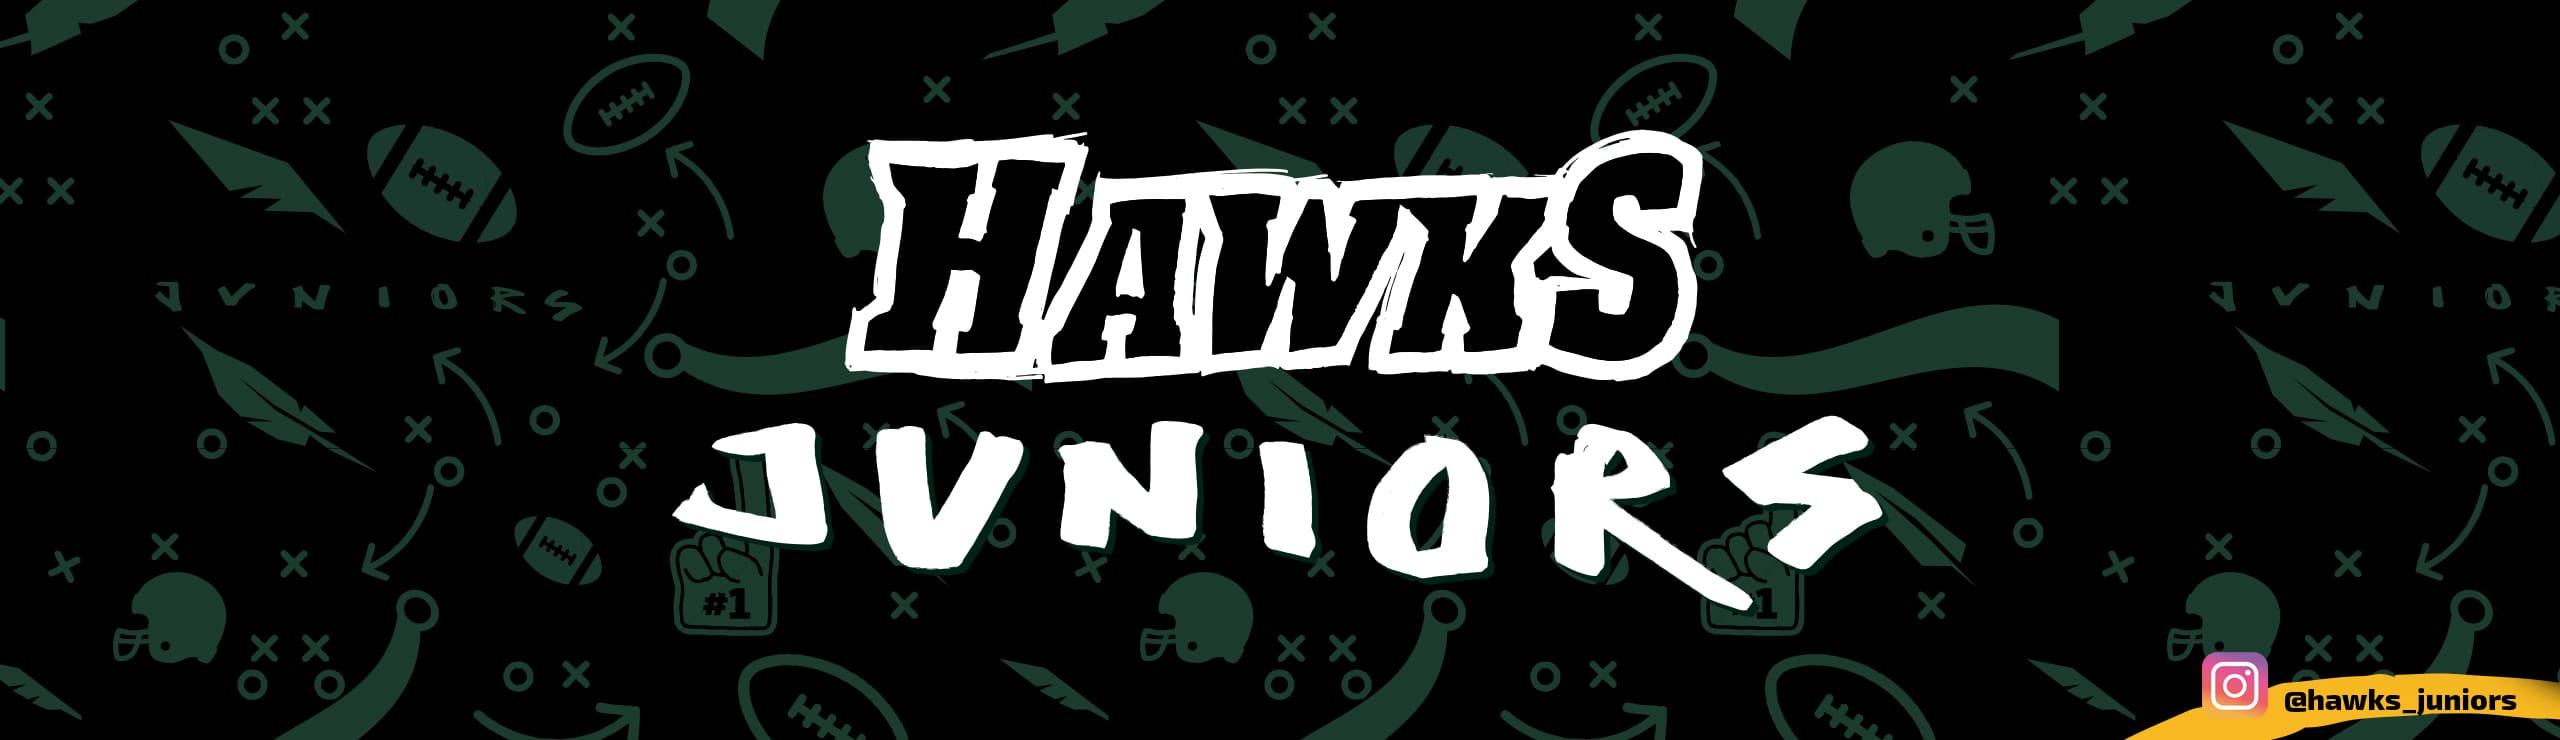 Hawks juniors u19 Tackle